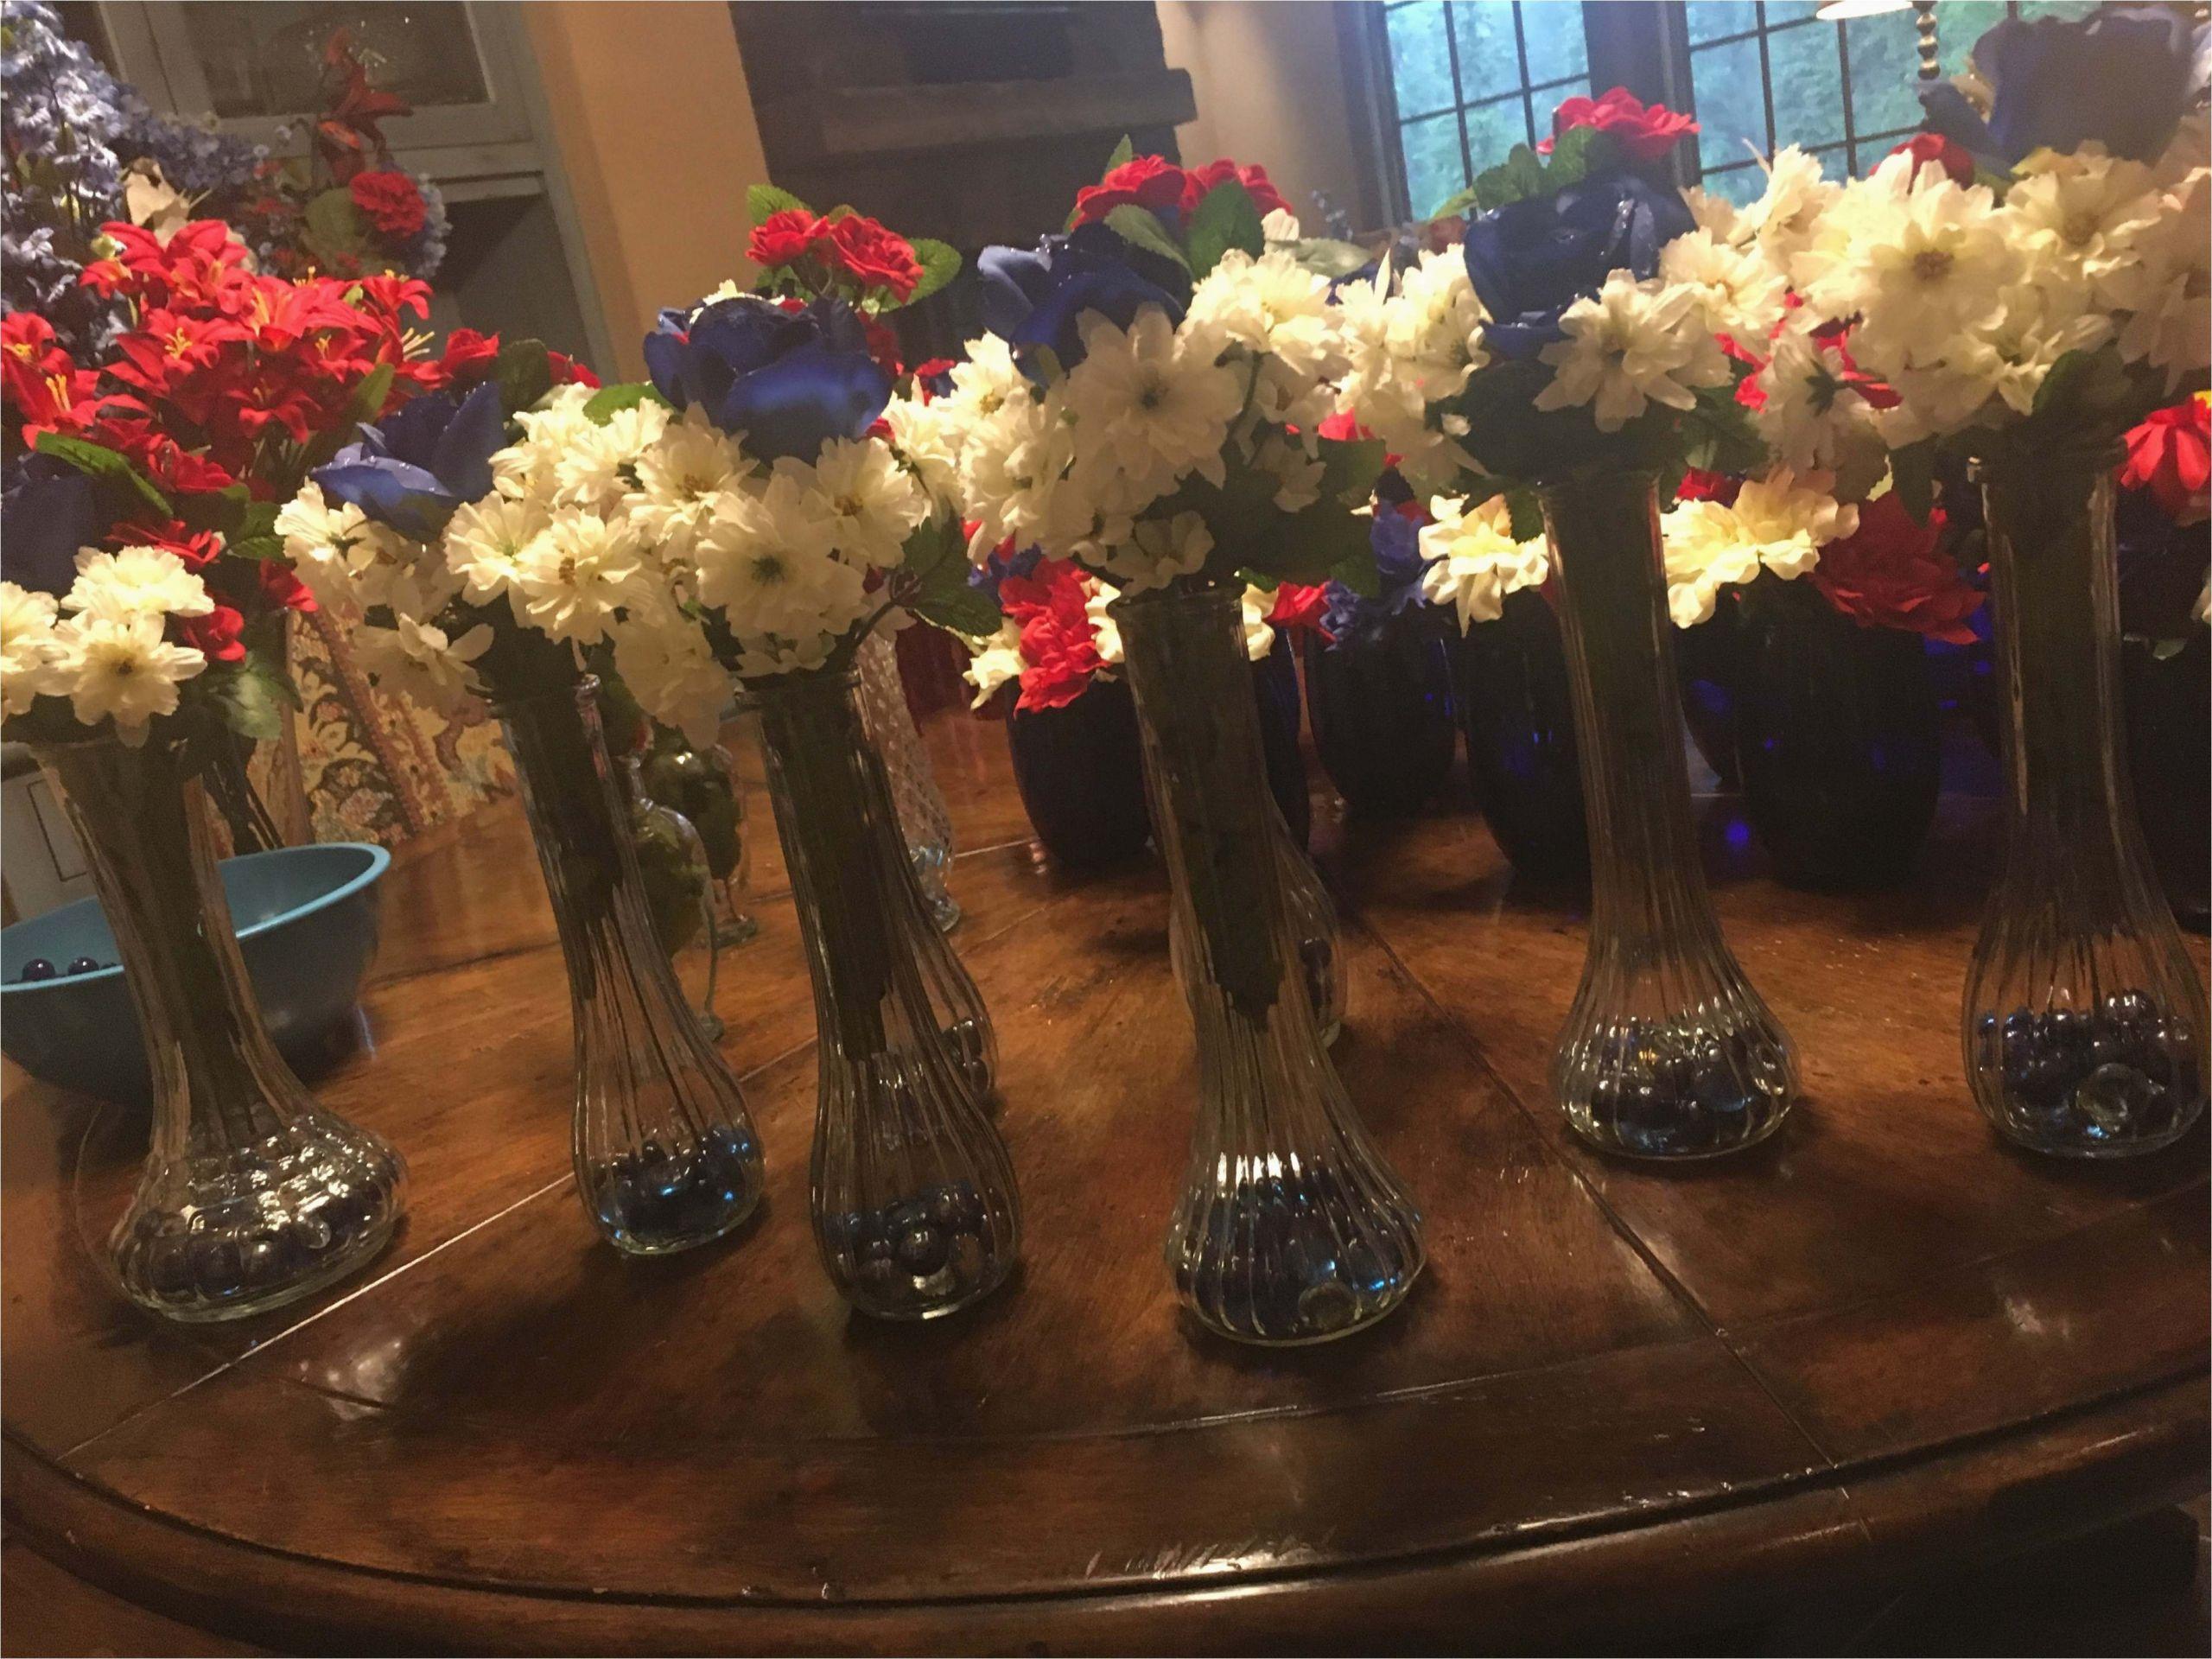 outdoor table vase of cool diy garden decor photos haccptemperature for beautiful diy wedding decor best dollar tree wedding decorations awesome h vases dollar vase i 0d